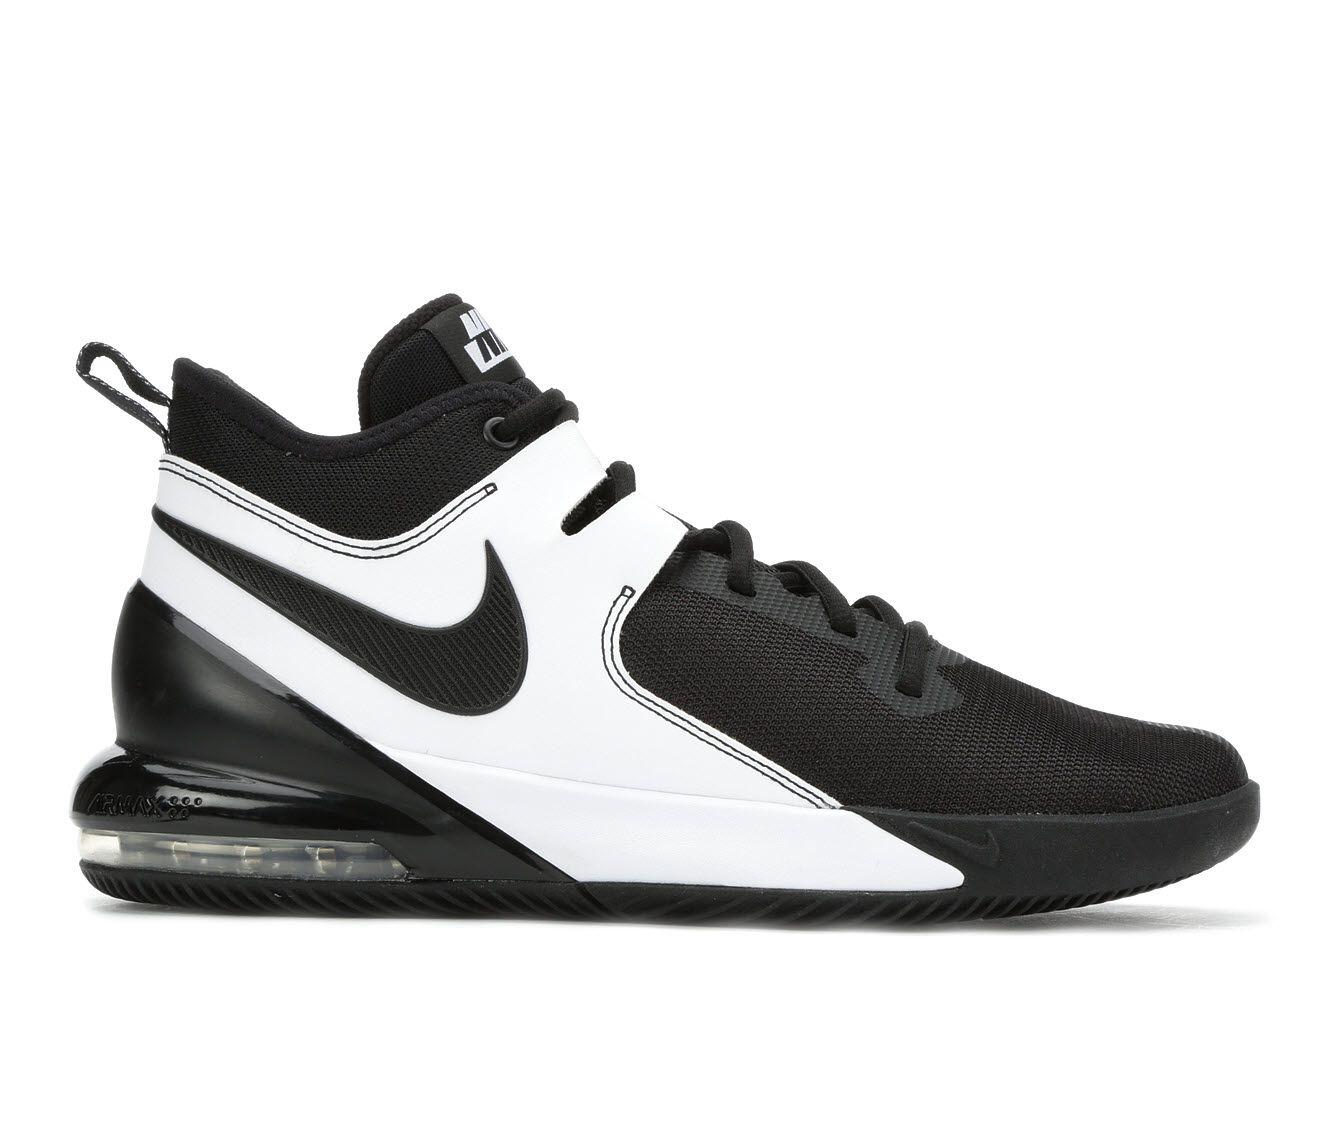 Nike Air Max Impact Basketball Shoes